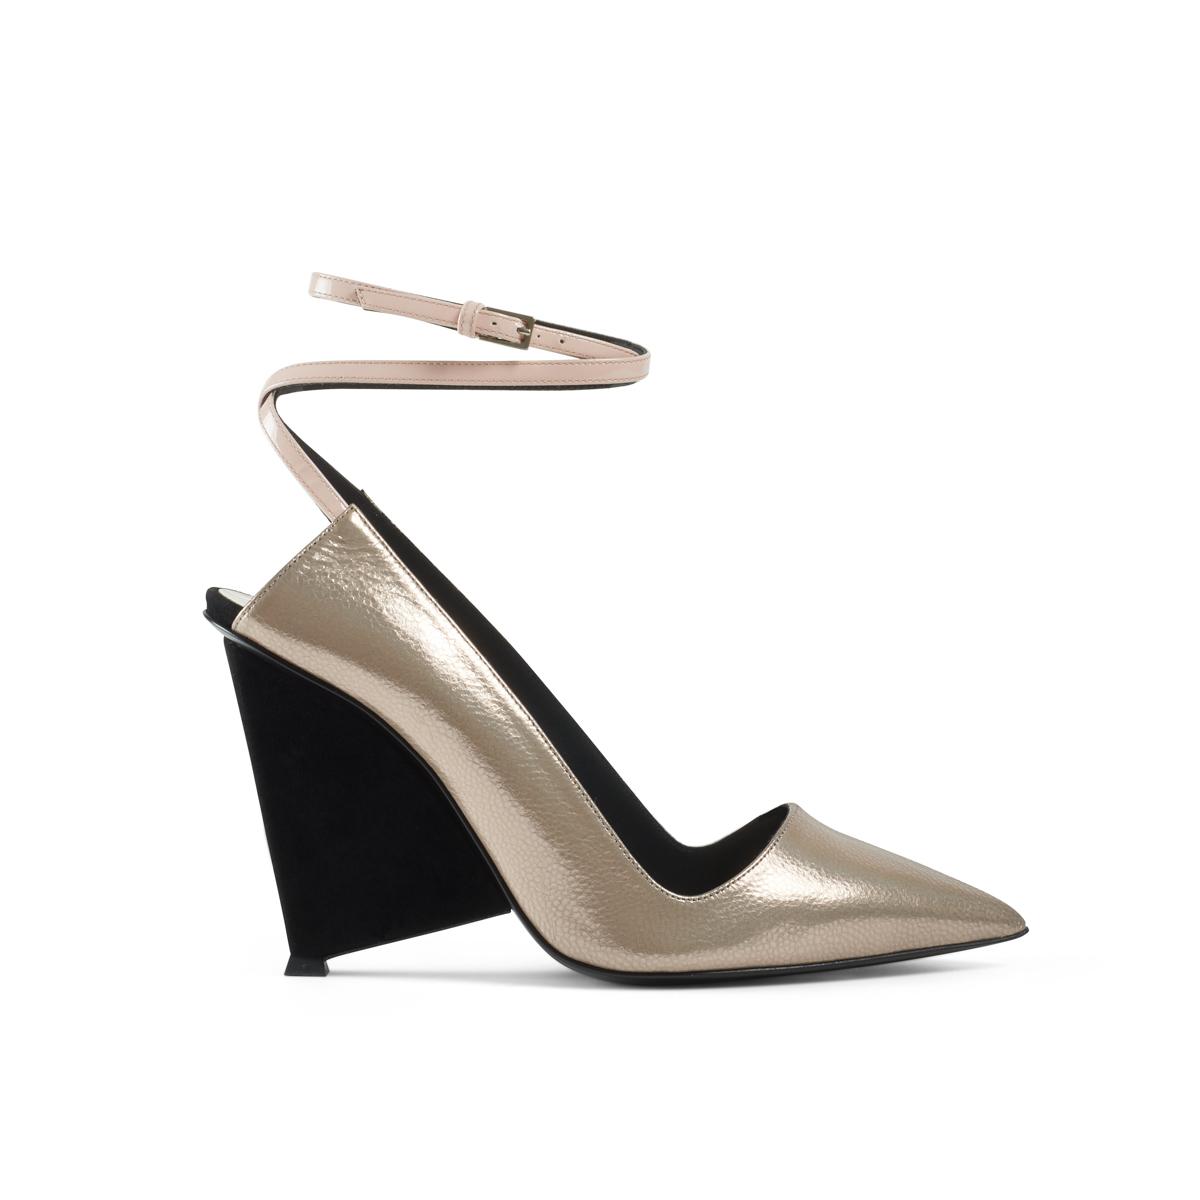 024_alaintondowski_springsummer2017_shoes_3072